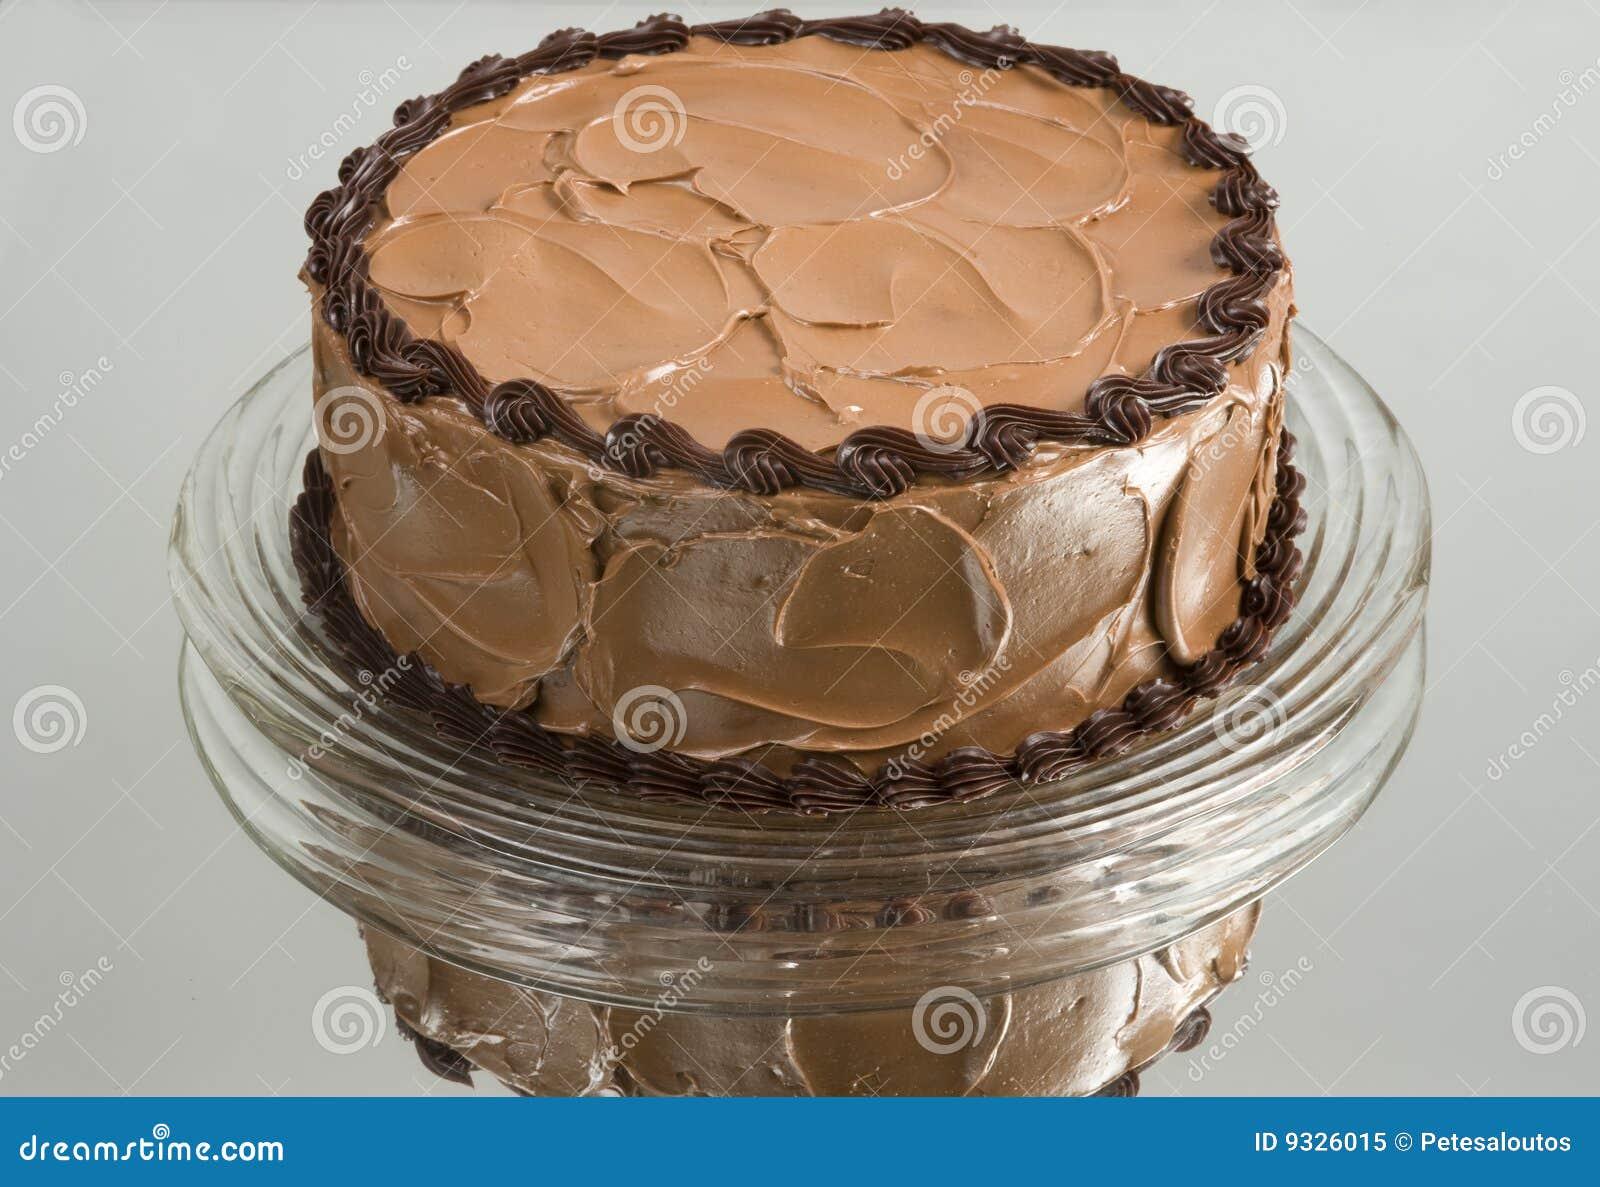 Torta di cioccolato casalinga